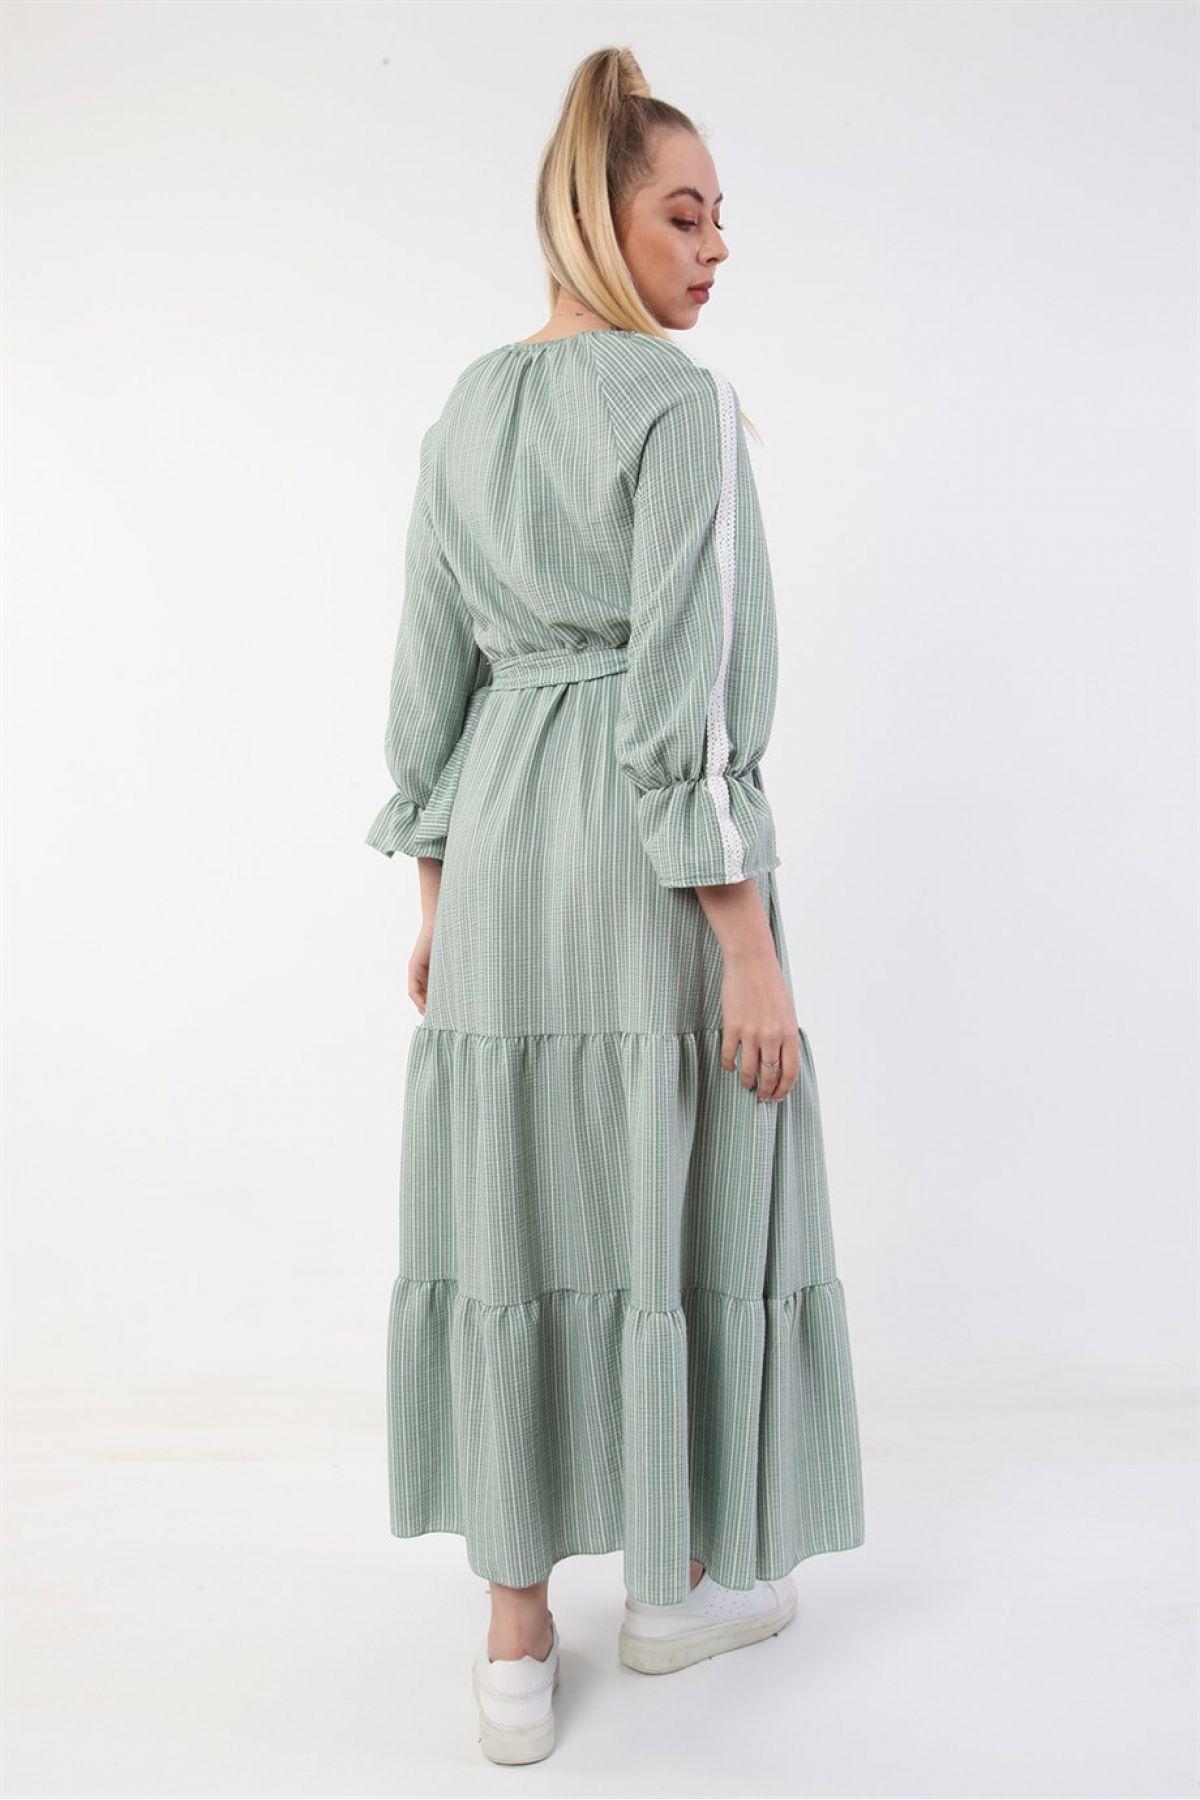 Casual Long Dresses-olive-drab